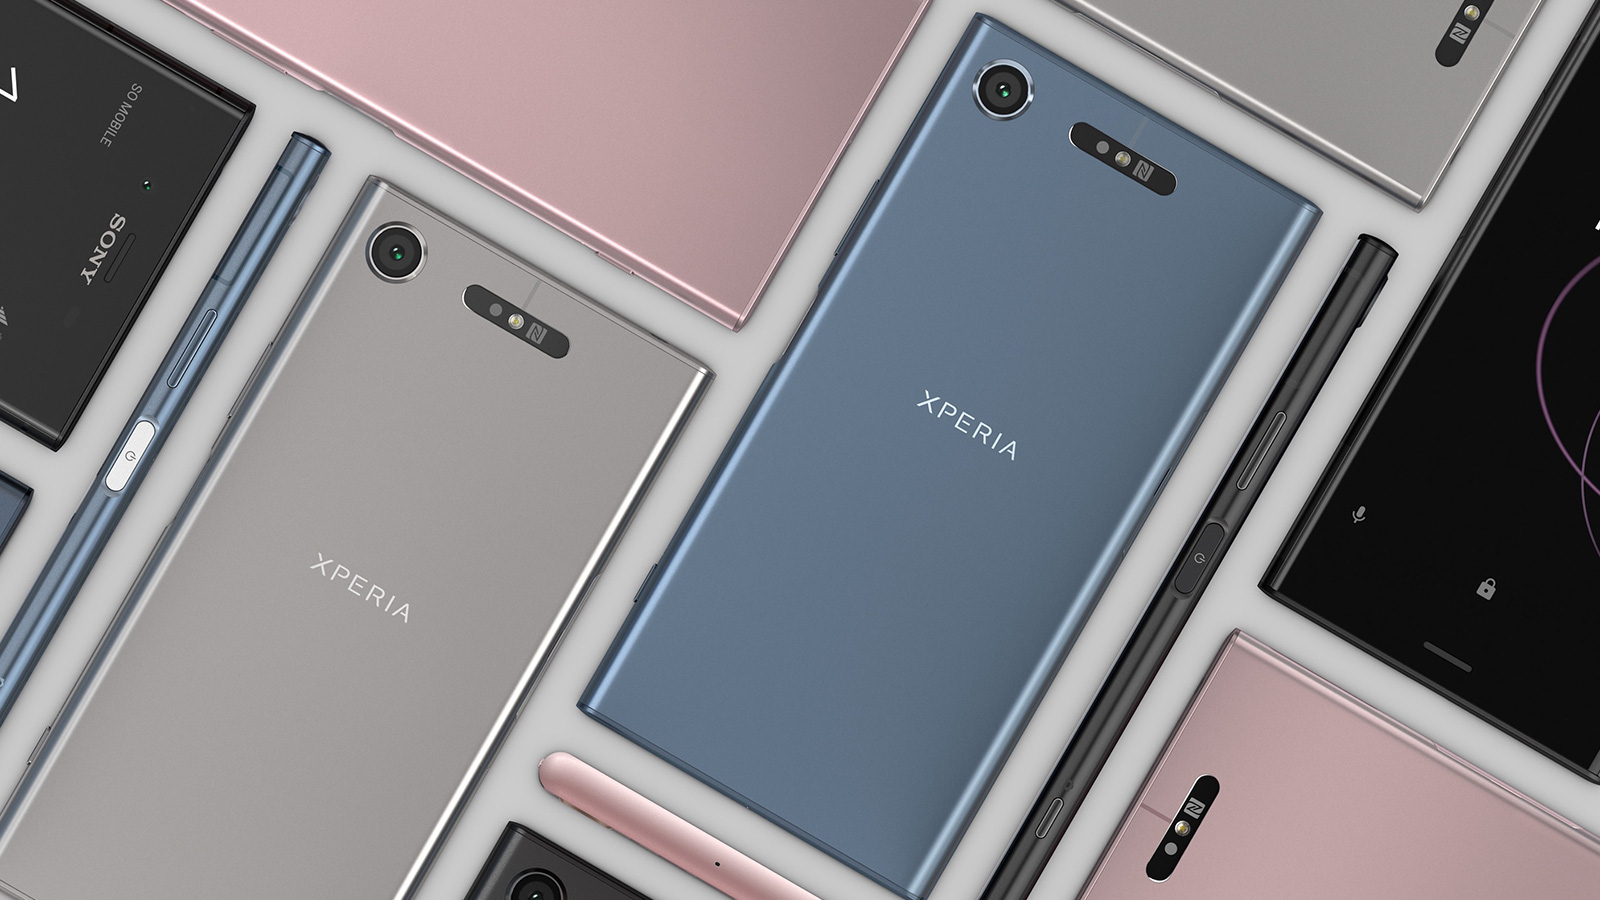 sony-quyet-tam-vuot-mat-Samsung-iPhone-2020-0